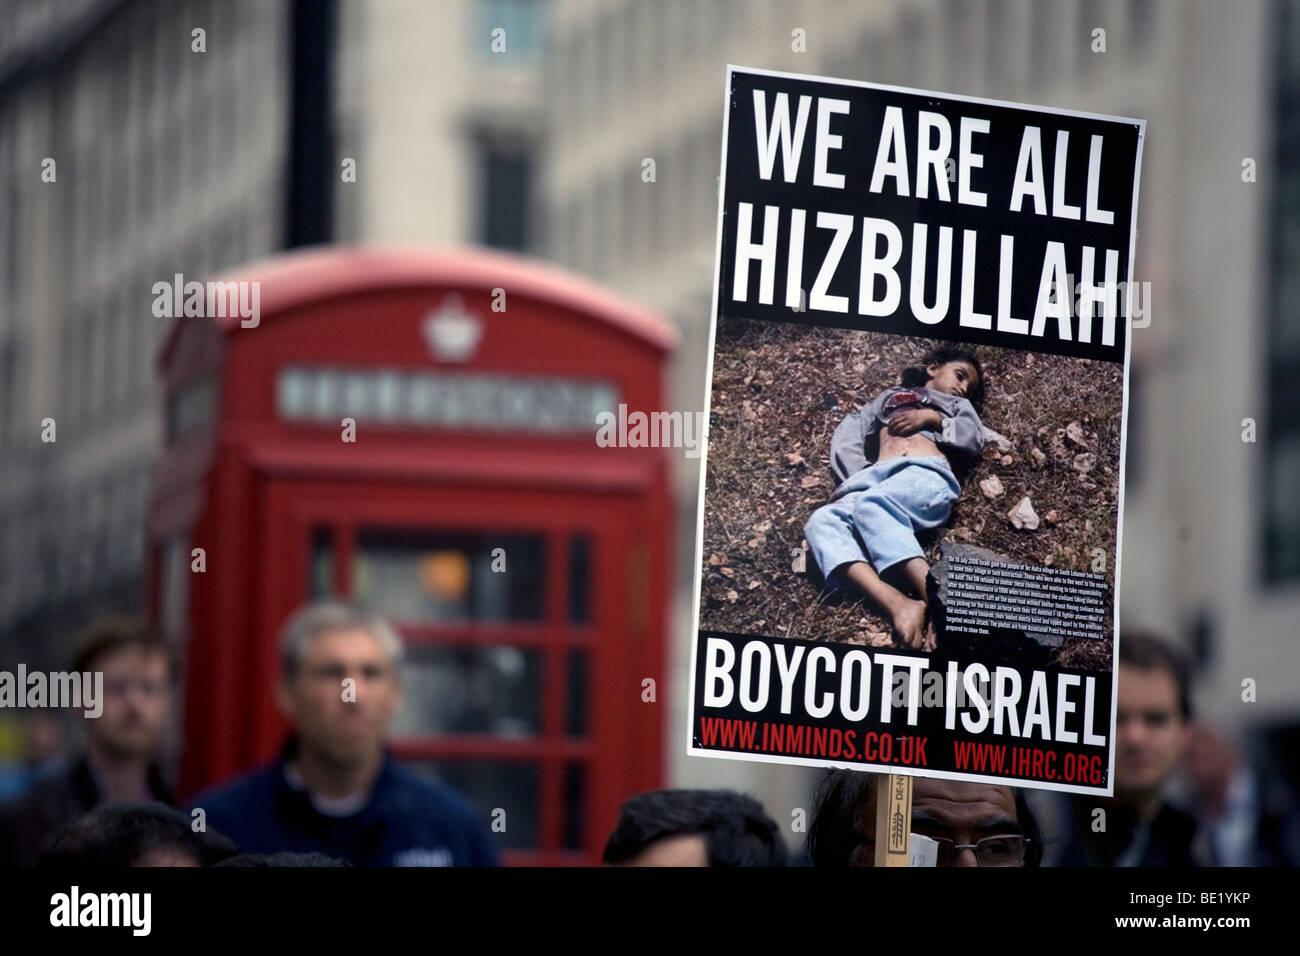 Al Quds demonstration against the state of Israel, held in London on September 13, 2009. - Stock Image